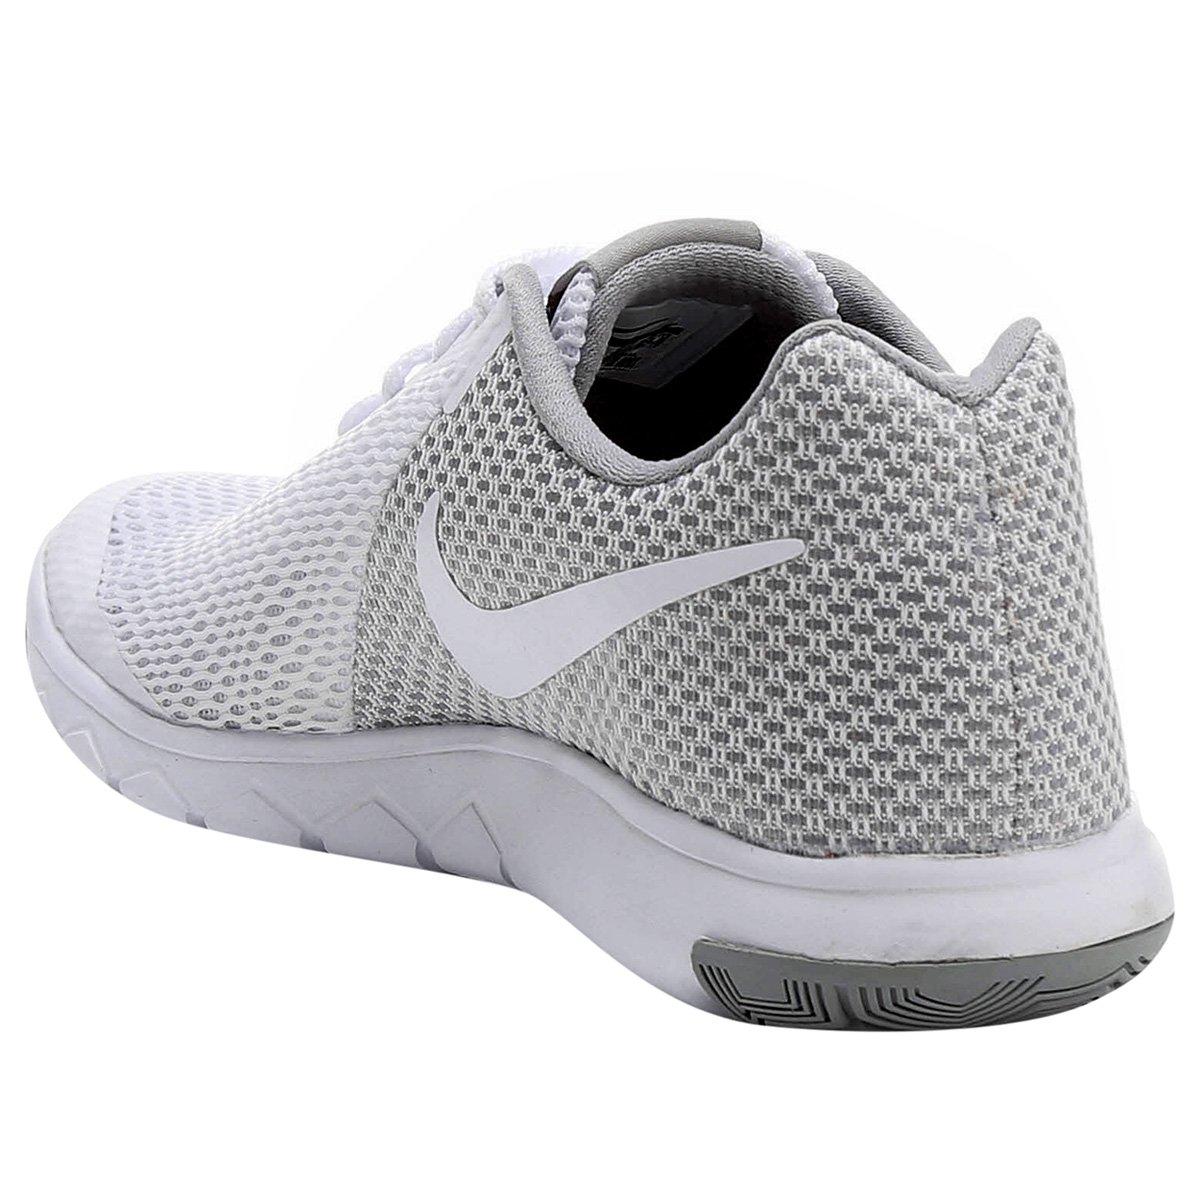 b278bbc879 Tênis Nike Flex Experience Rn 6 Feminino - Branco e Cinza - Compre ...